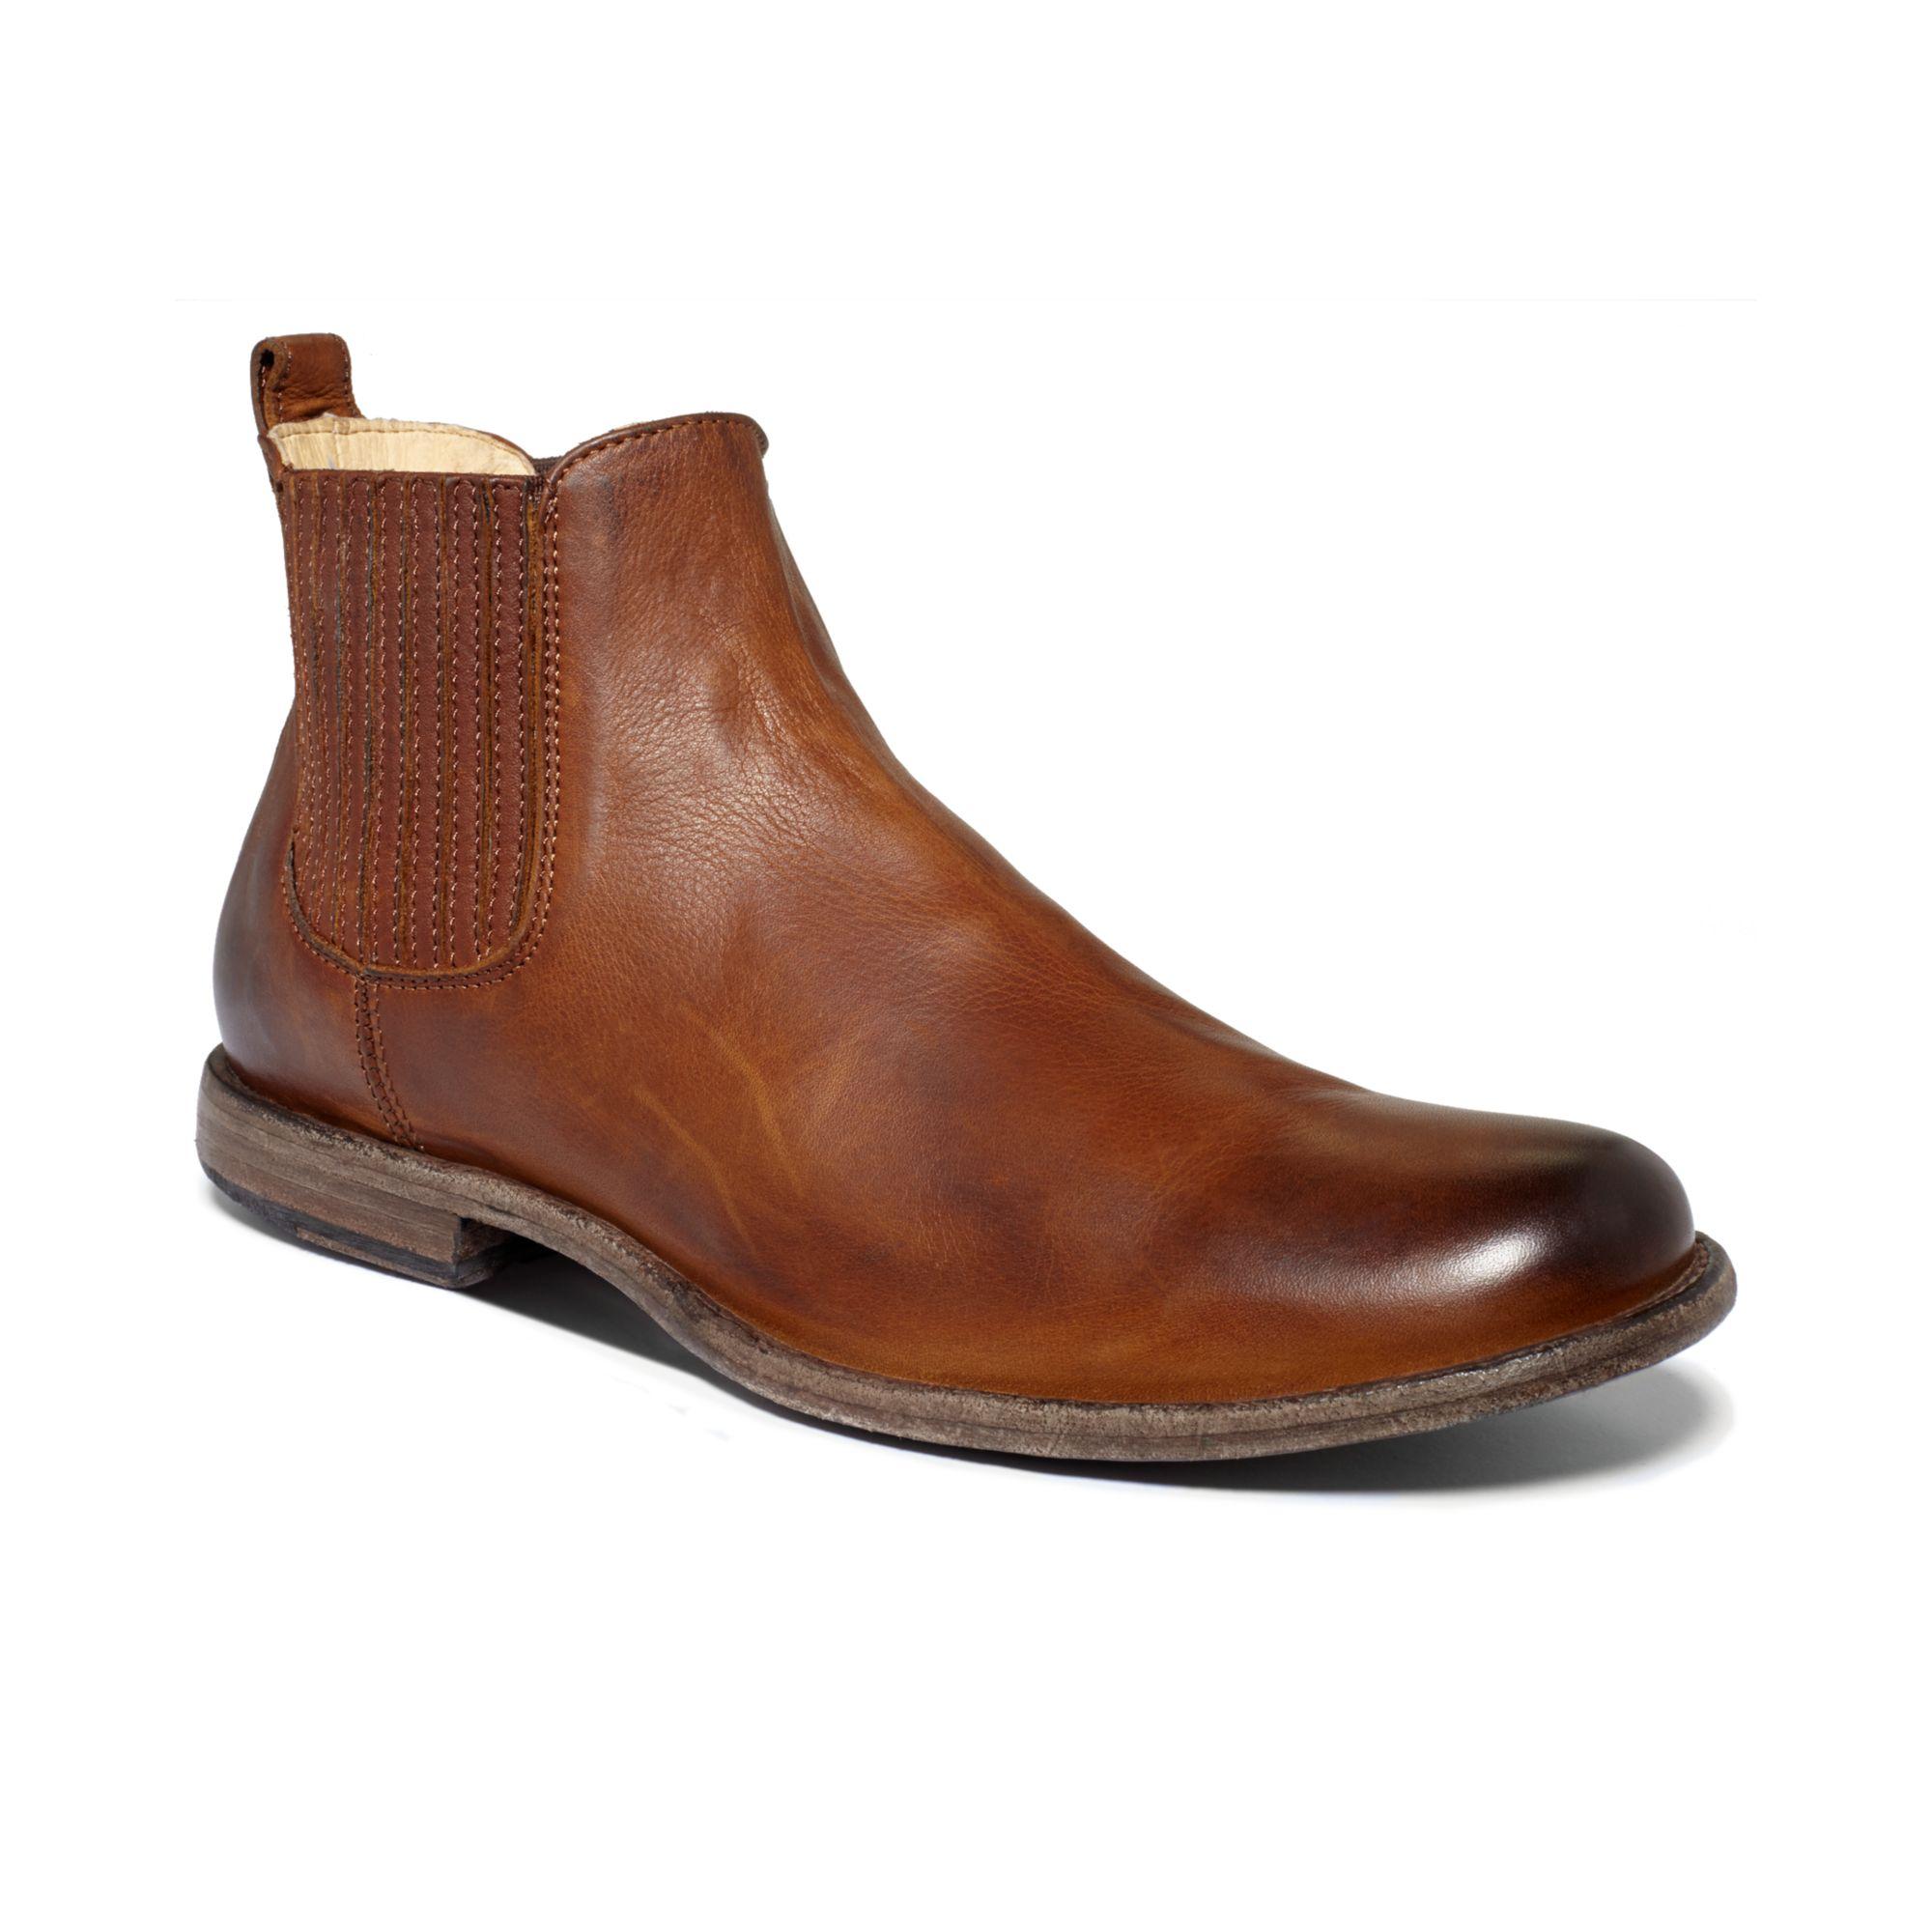 frye chelsea boots in brown for men cognac lyst. Black Bedroom Furniture Sets. Home Design Ideas